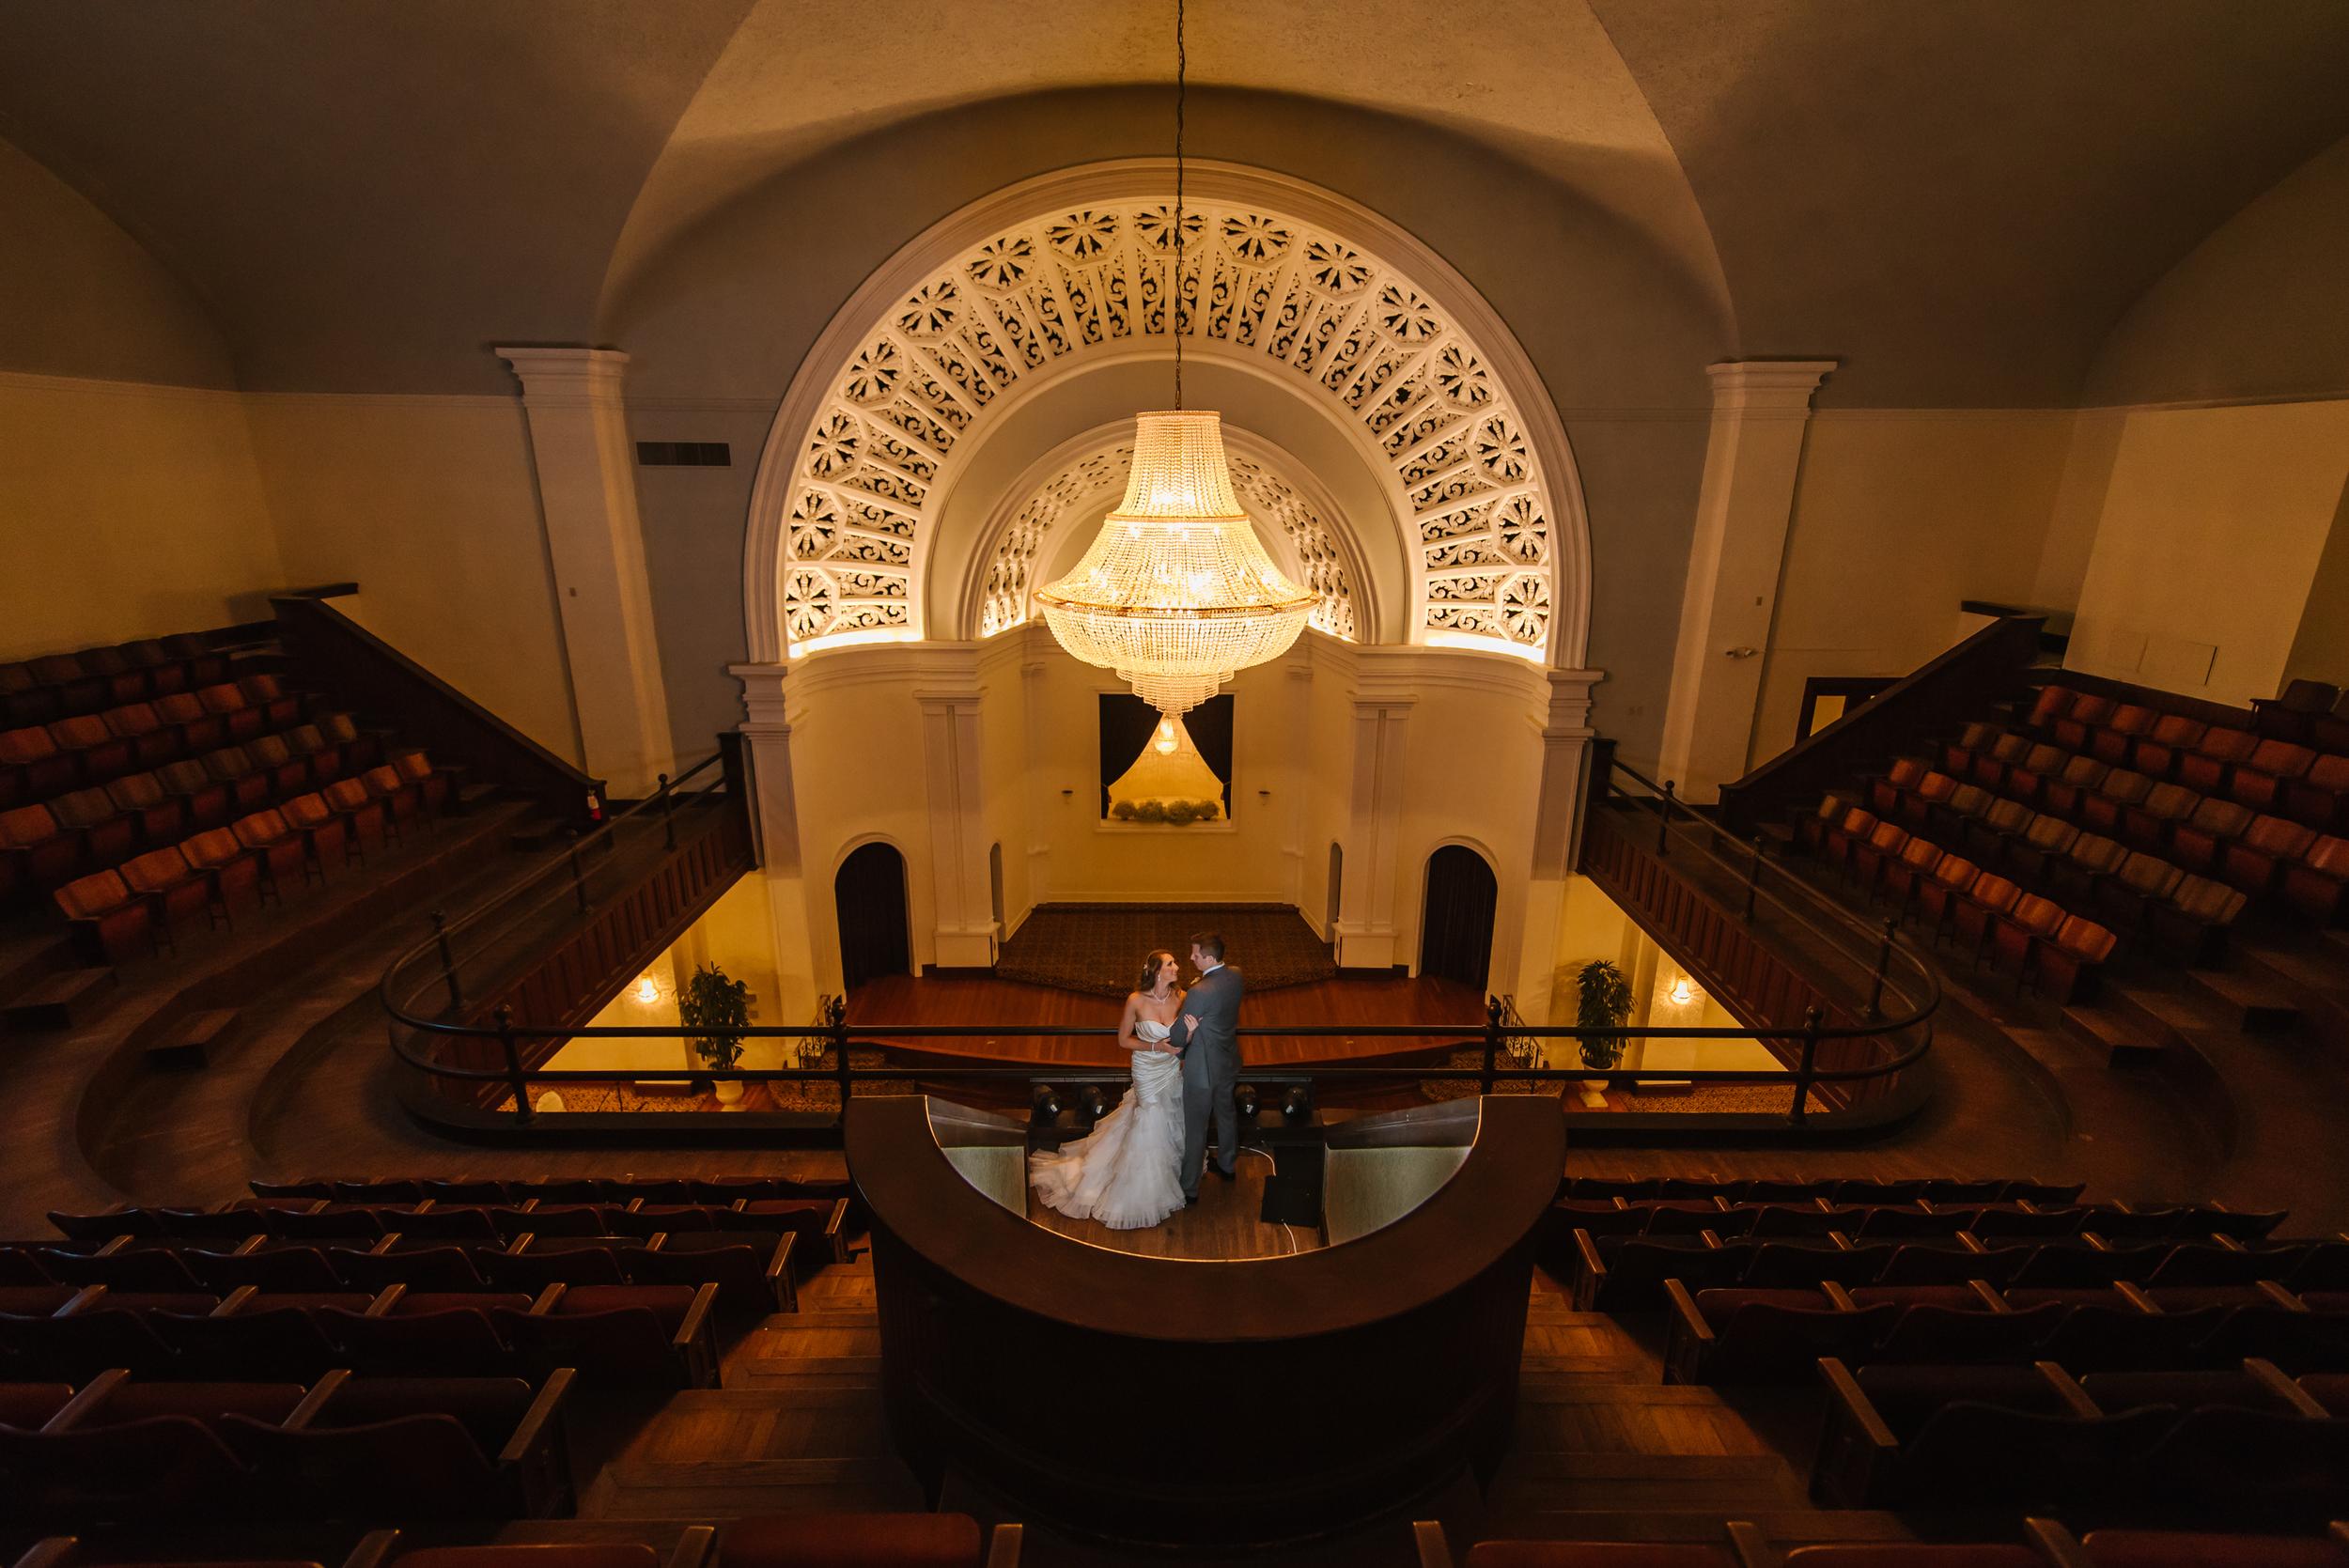 tampa-wedding-photographer-mirror-lake-lyceum-st-pete-saint-petersburg-bride-groom-portrait-luxury-lighting